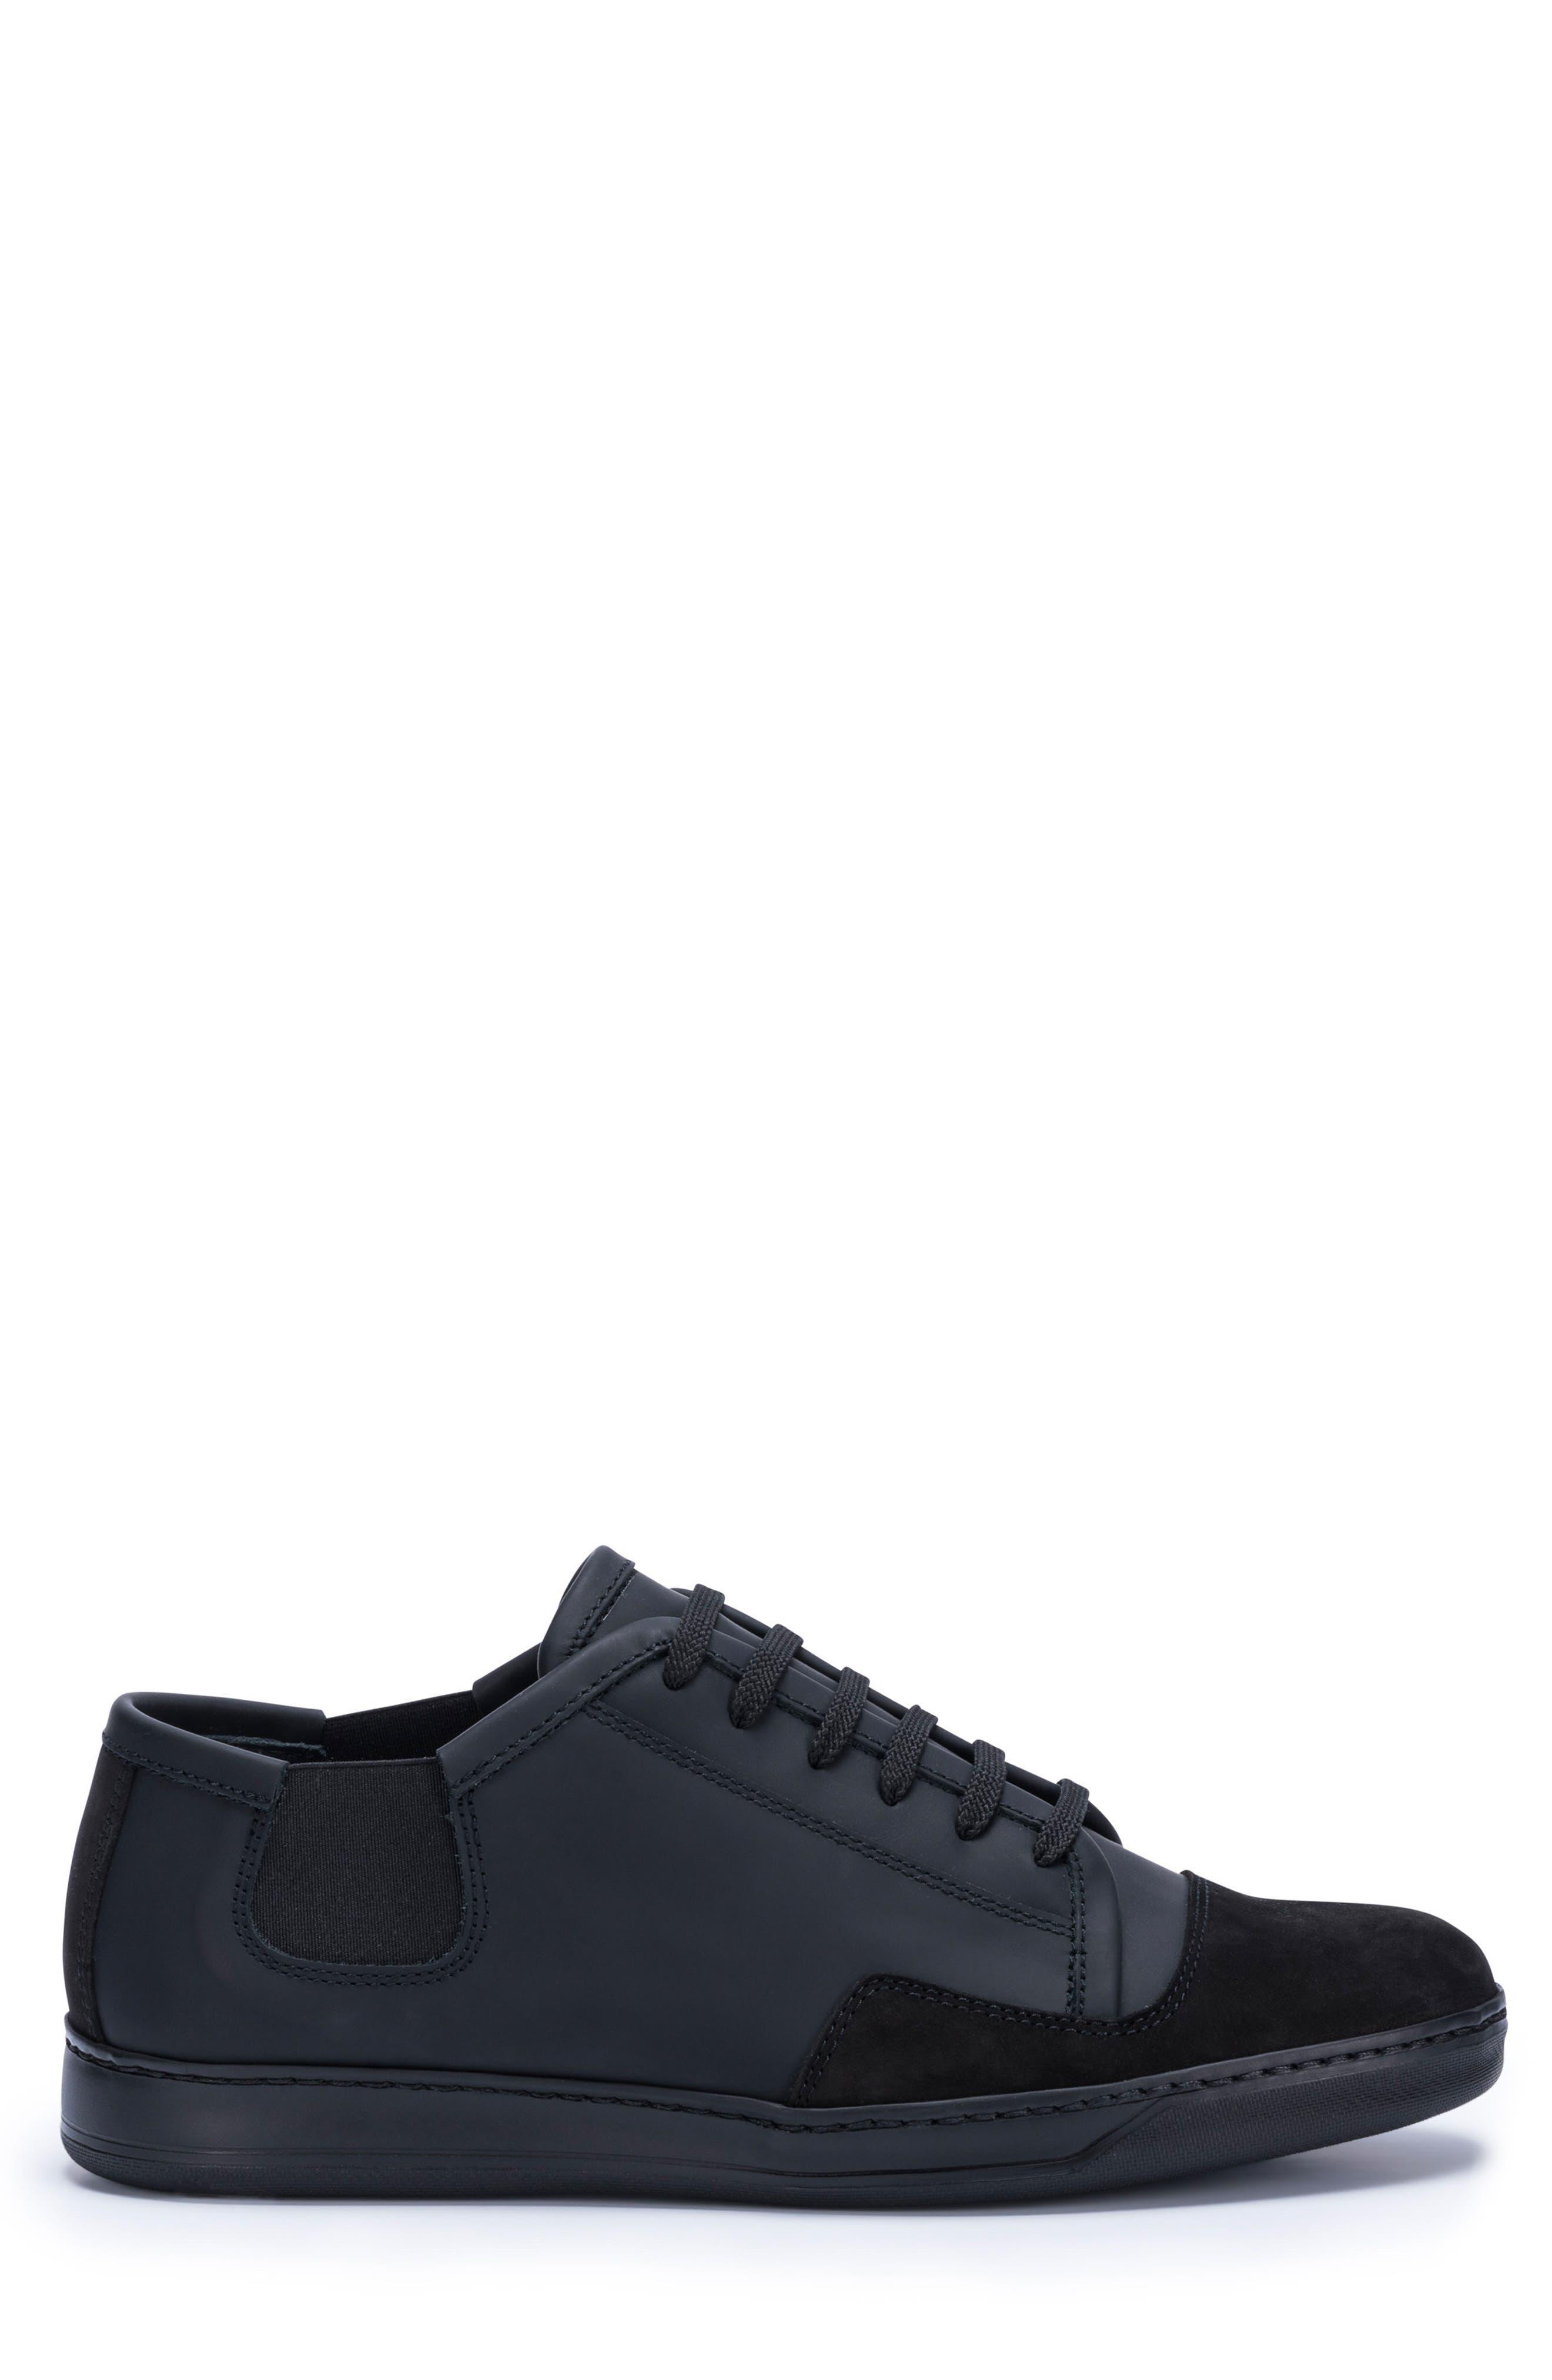 Bellagio Sneaker,                             Alternate thumbnail 3, color,                             Black